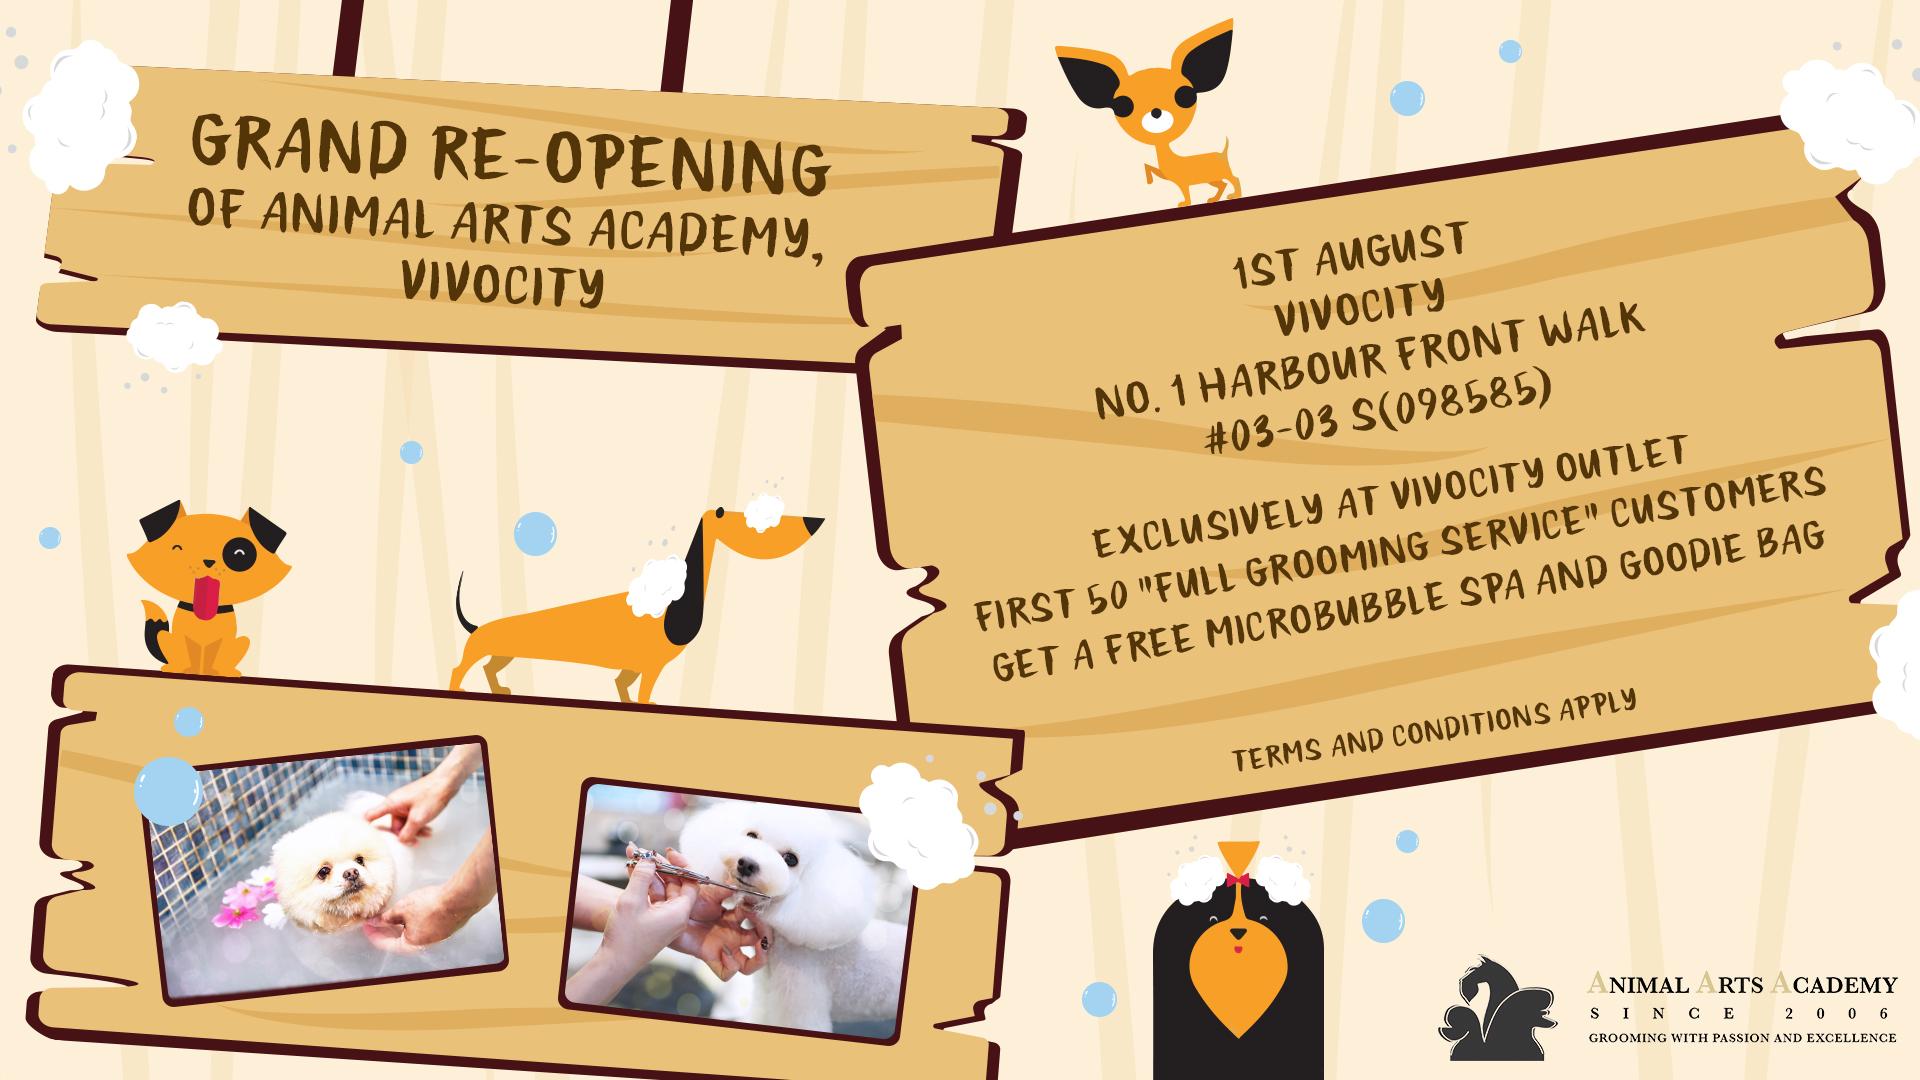 Grand Re-Opening of Animal Arts Academy, Vivocity